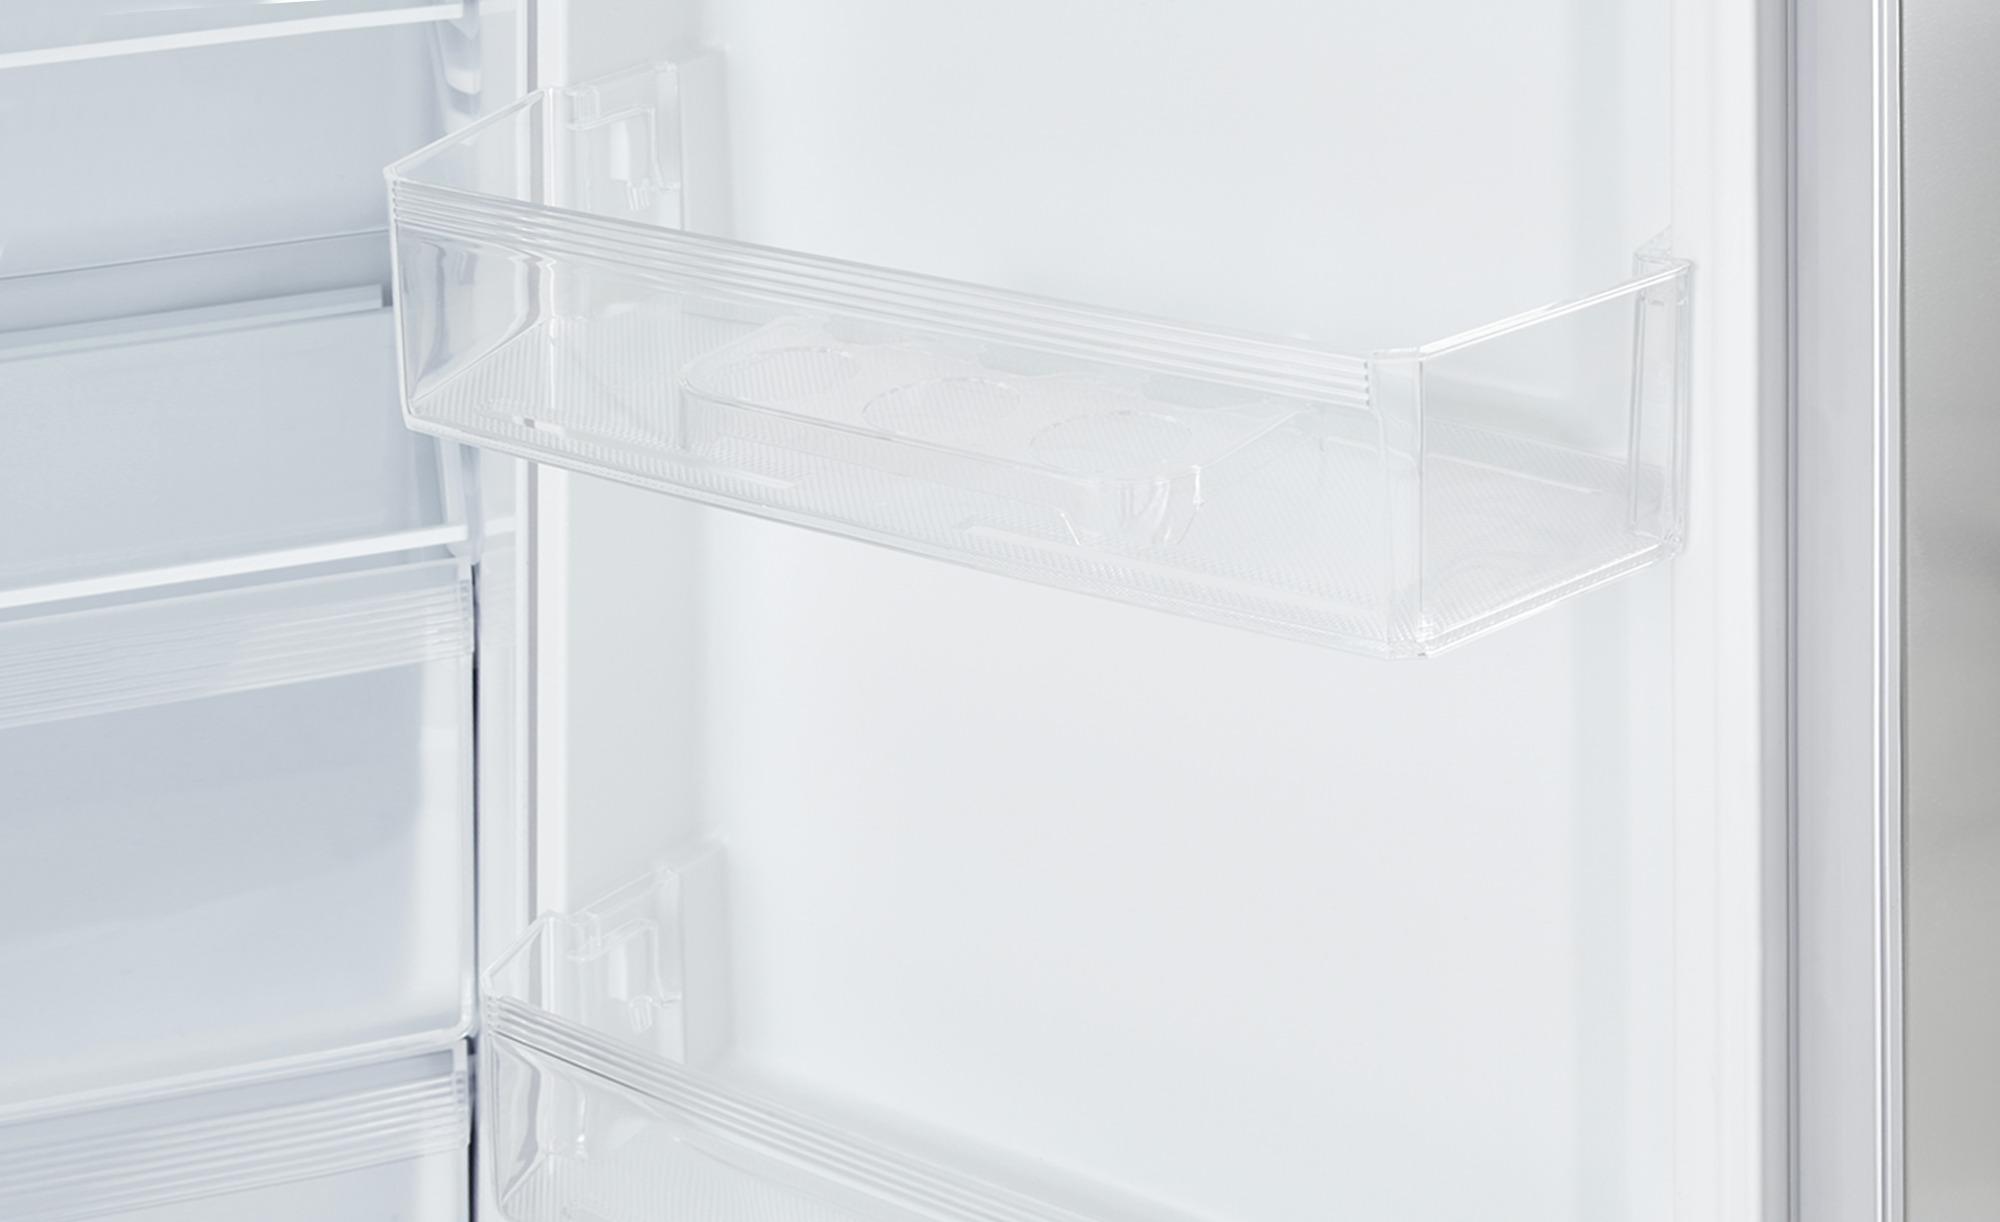 Side By Side Kühlschrank Gewicht : Khg side by side sbs 527 eo möbel höffner